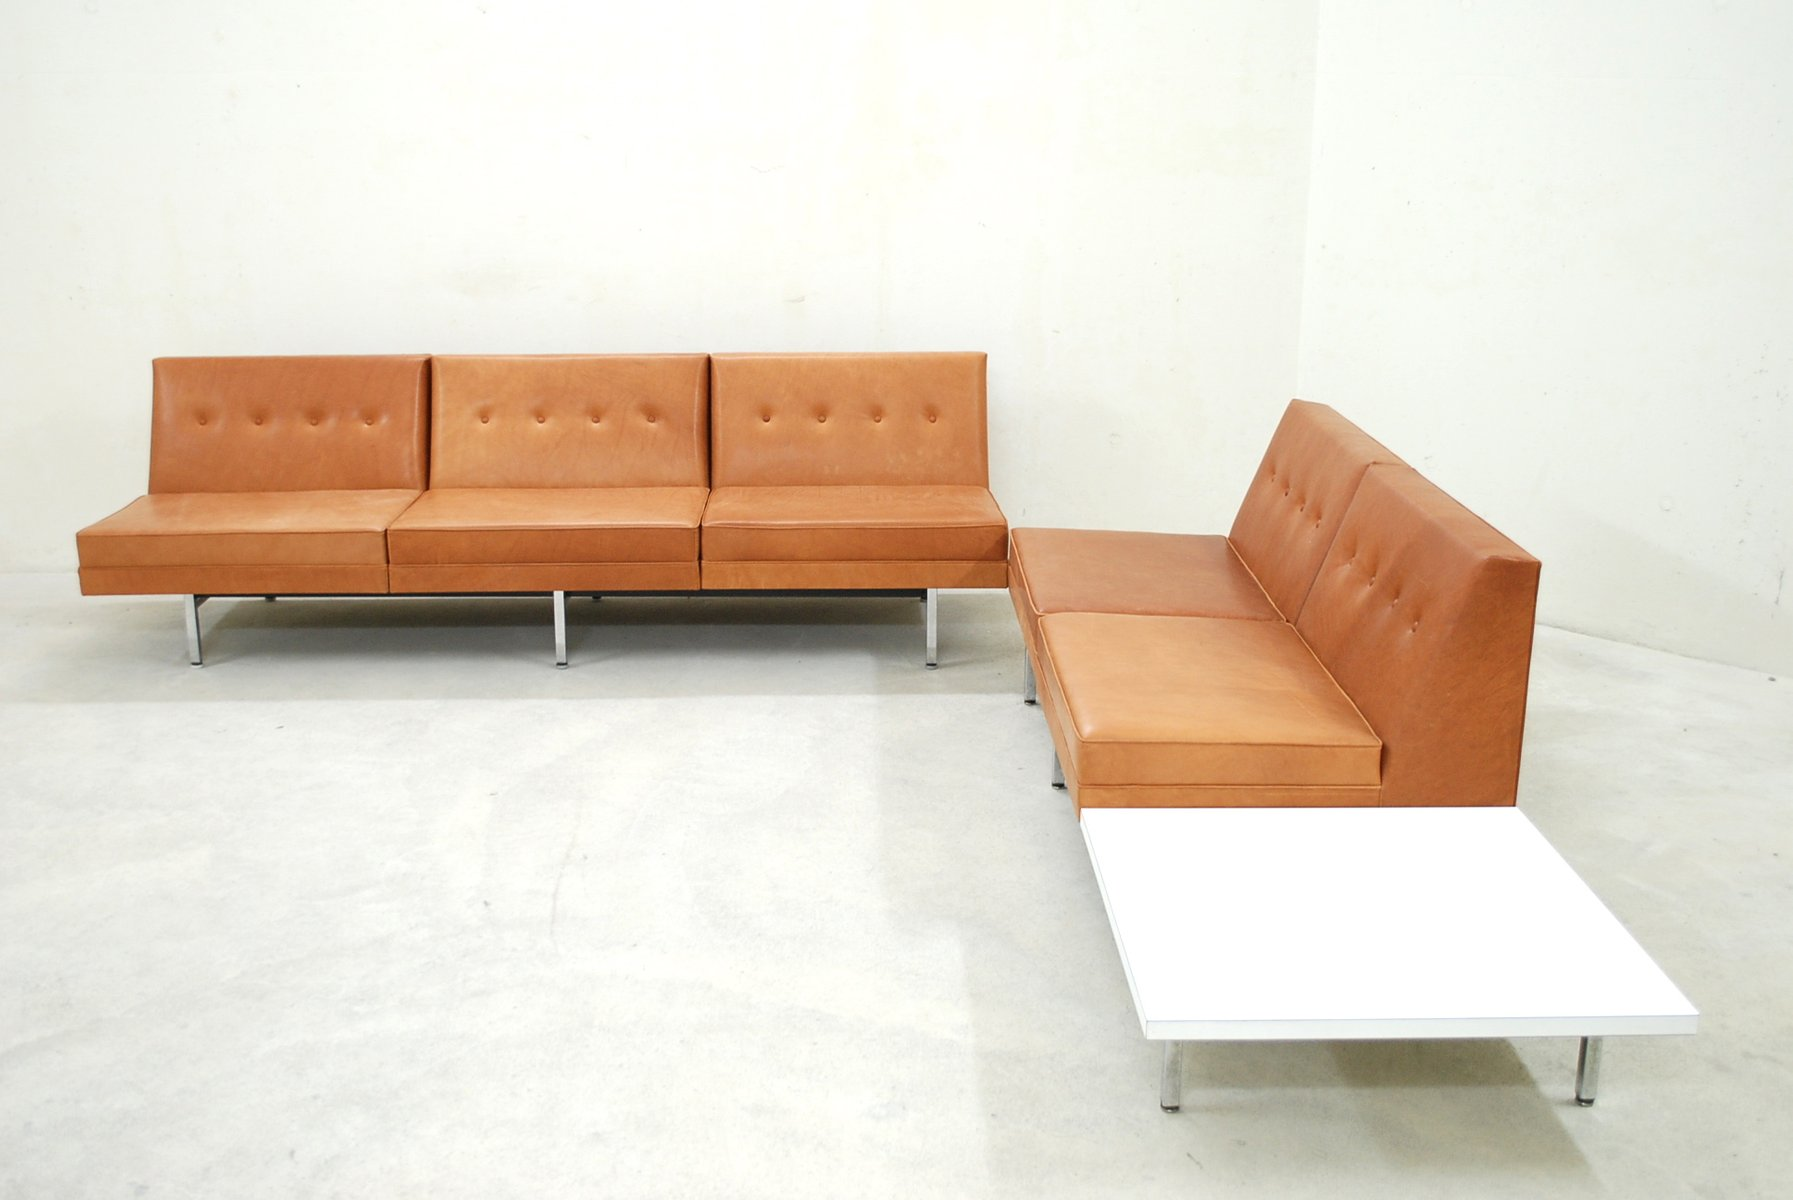 cognac leather modular sofa set by george nelson for herman miller  - cognac leather modular sofa set by george nelson for herman miller